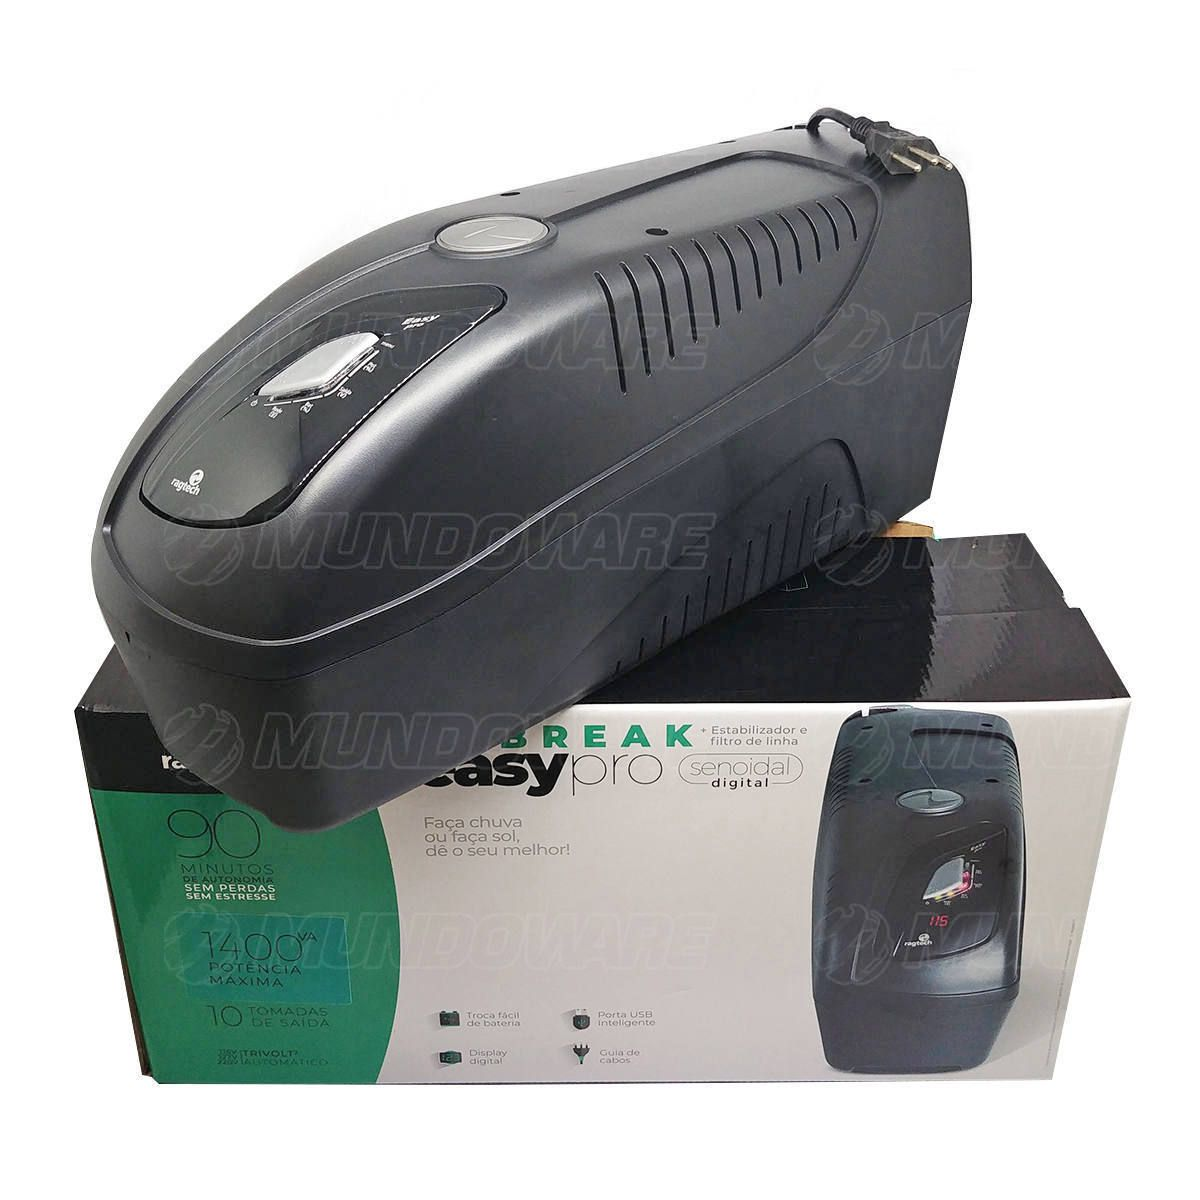 Nobreak Senoidal Puro 1400VA 980W Display Digital 10 Tomadas Engate Bateria Externa USB Inteligente Trivolt Ragtech 4035